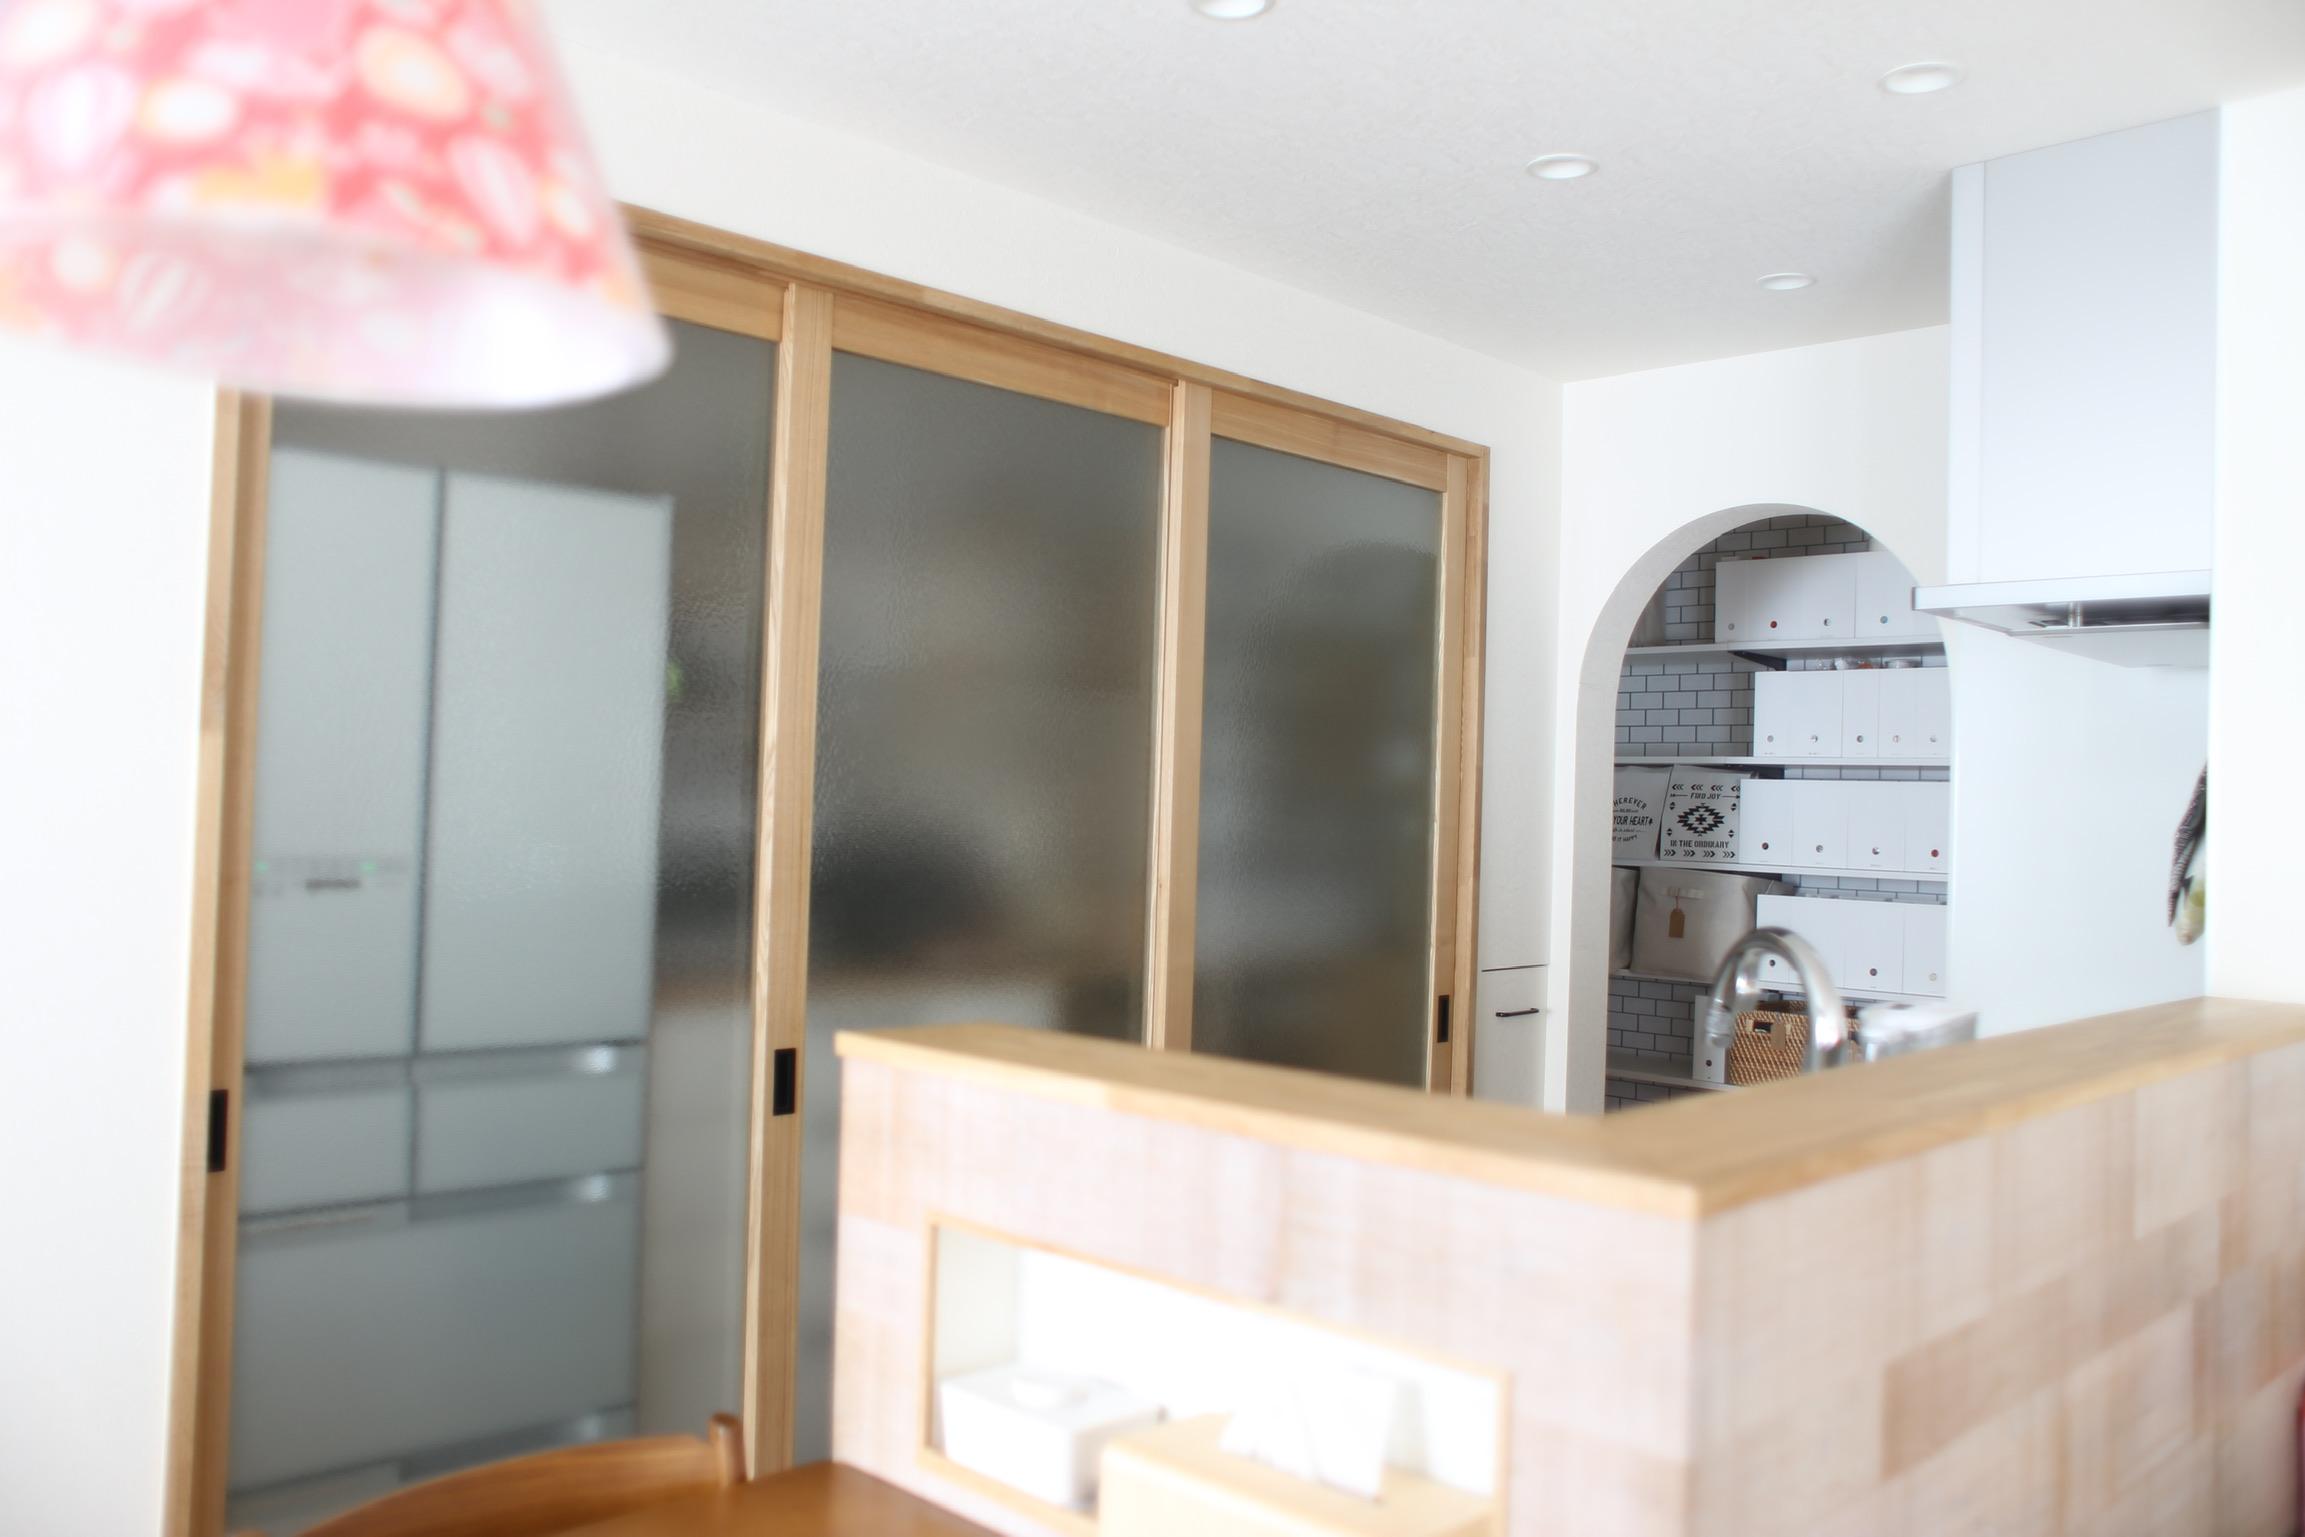 《web内覧会2019》キッチン背面収納1 引き戸で隠す収納/少し重たい造作引き戸